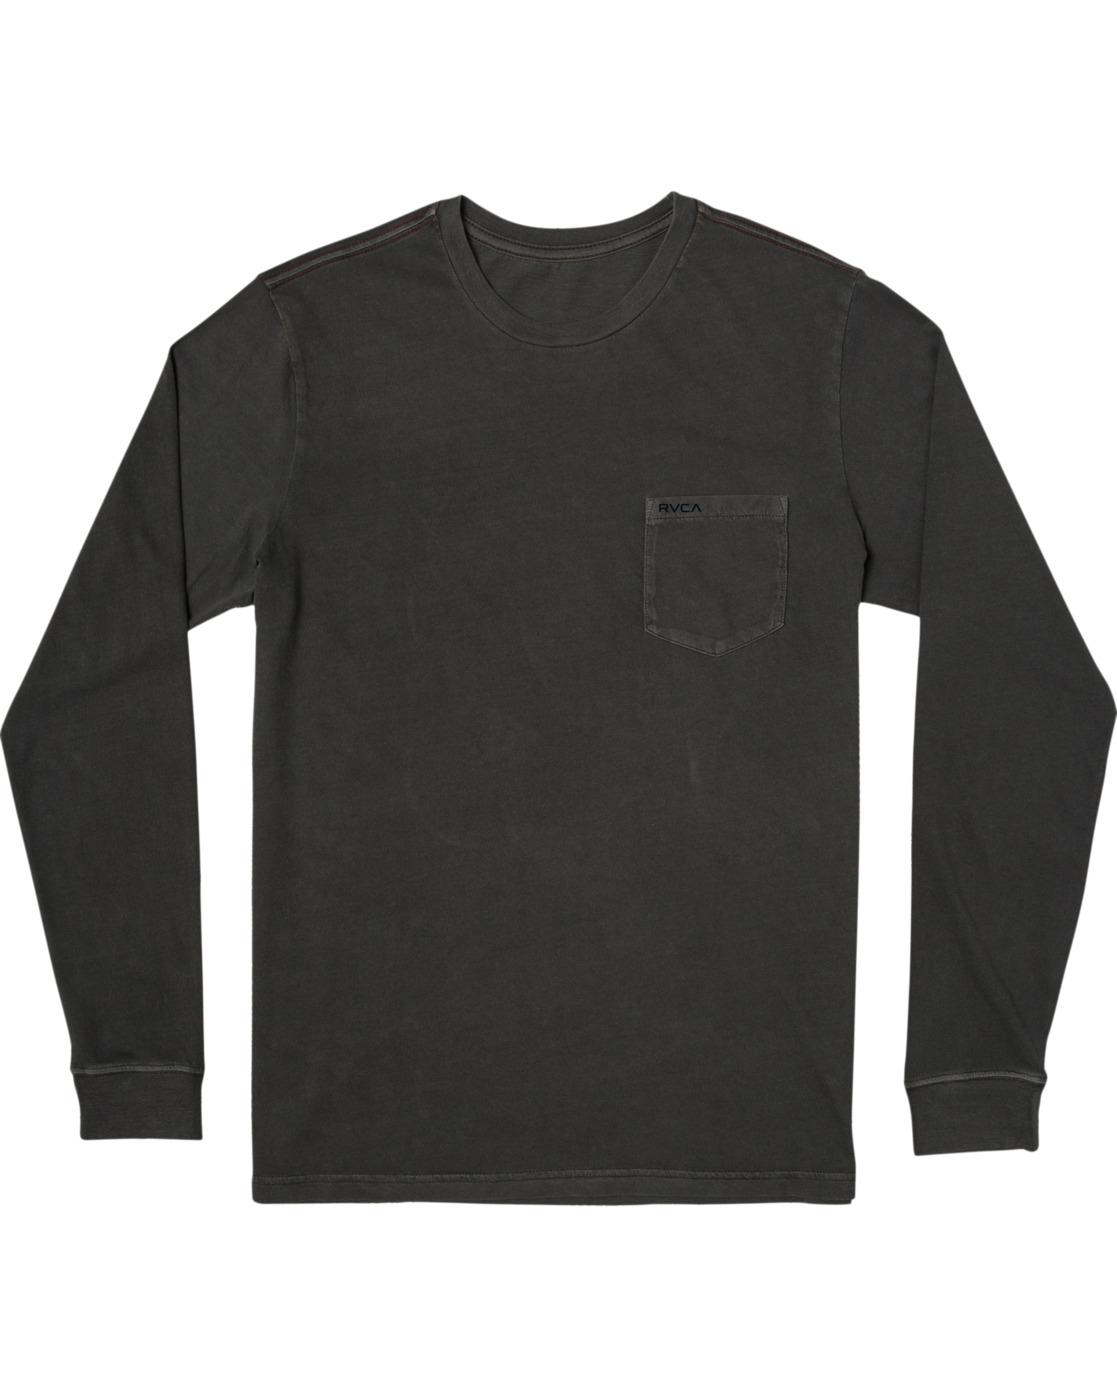 0 PTC Pigment Long Sleeve TEE Black M467TRPT RVCA